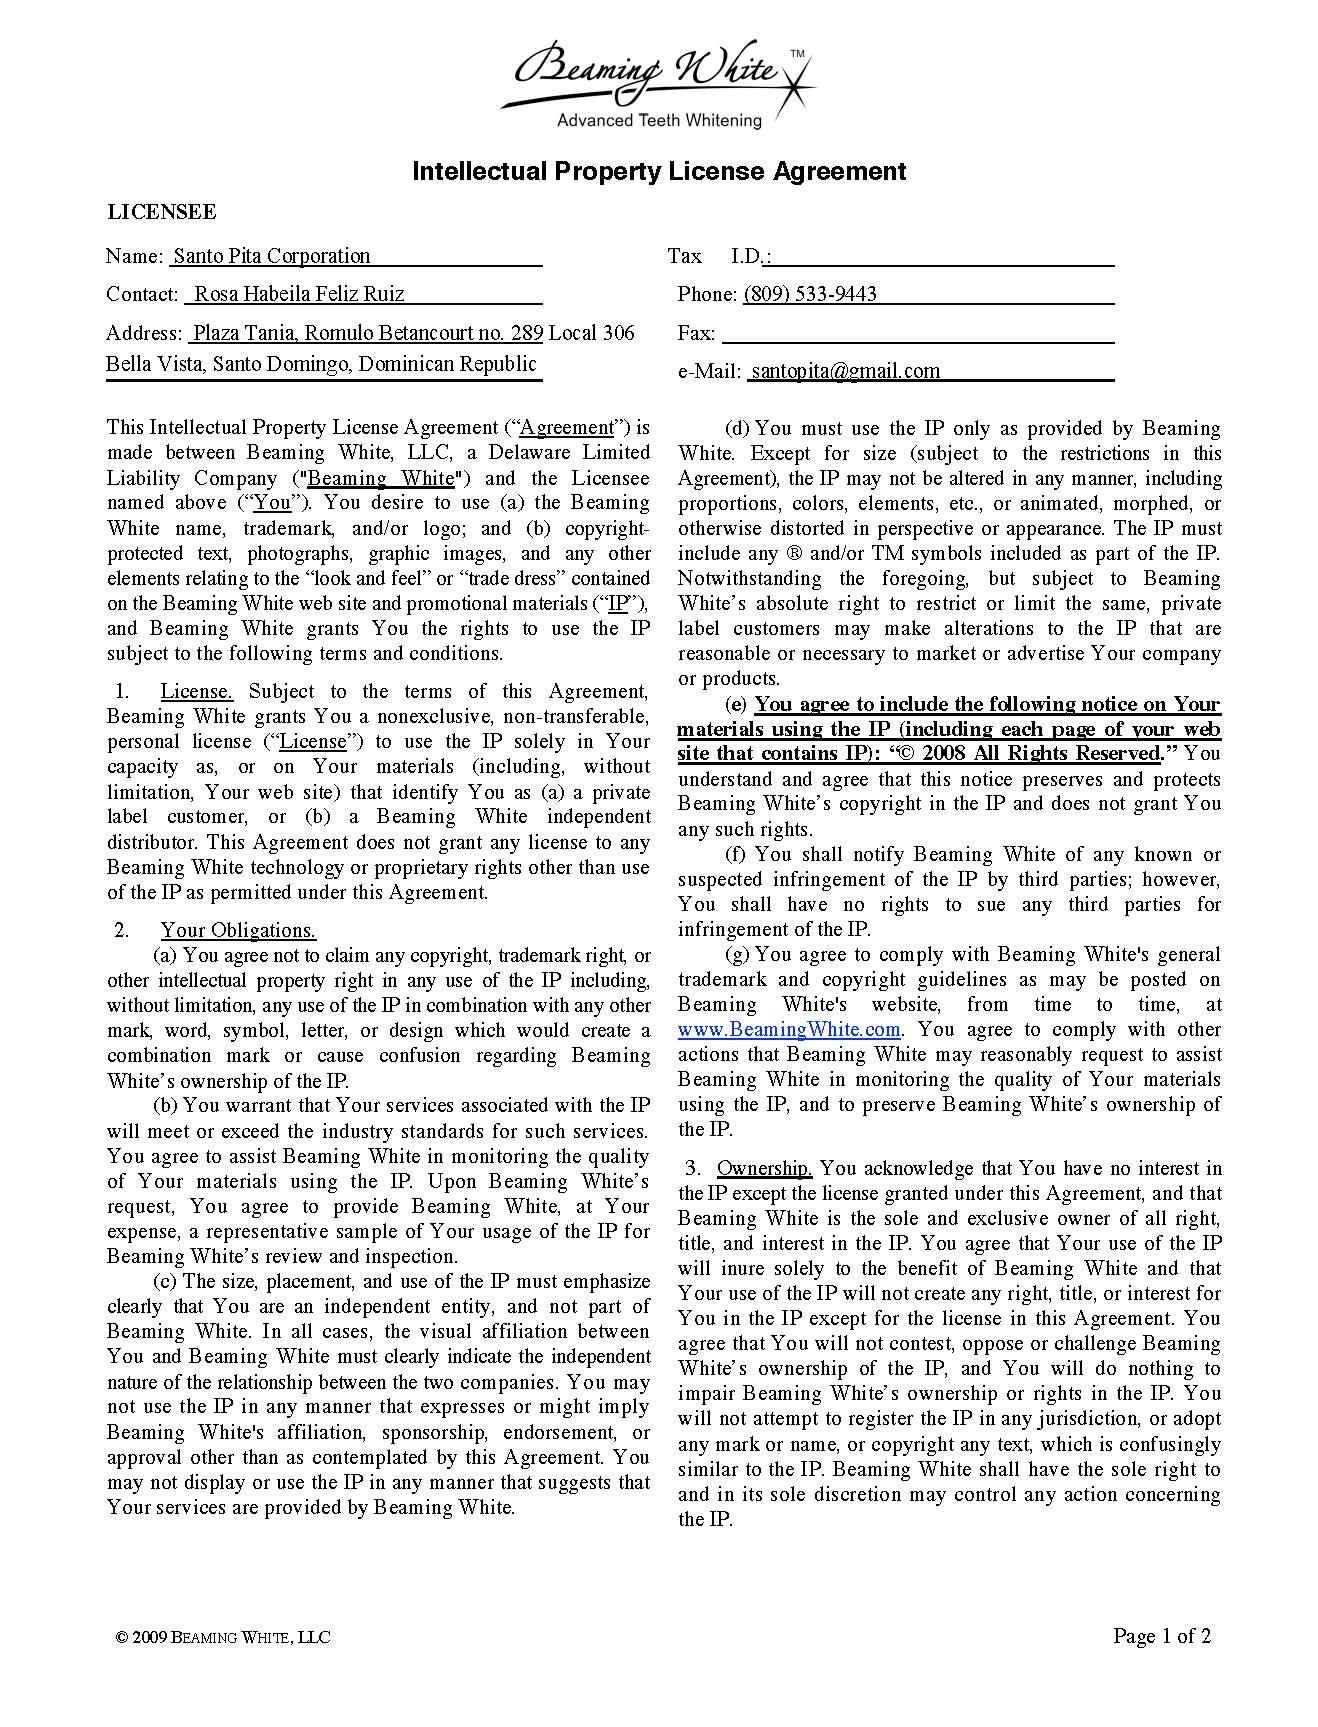 Exhibit   Intellectual Property License Agreement With Intellectual Property License Agreement Template